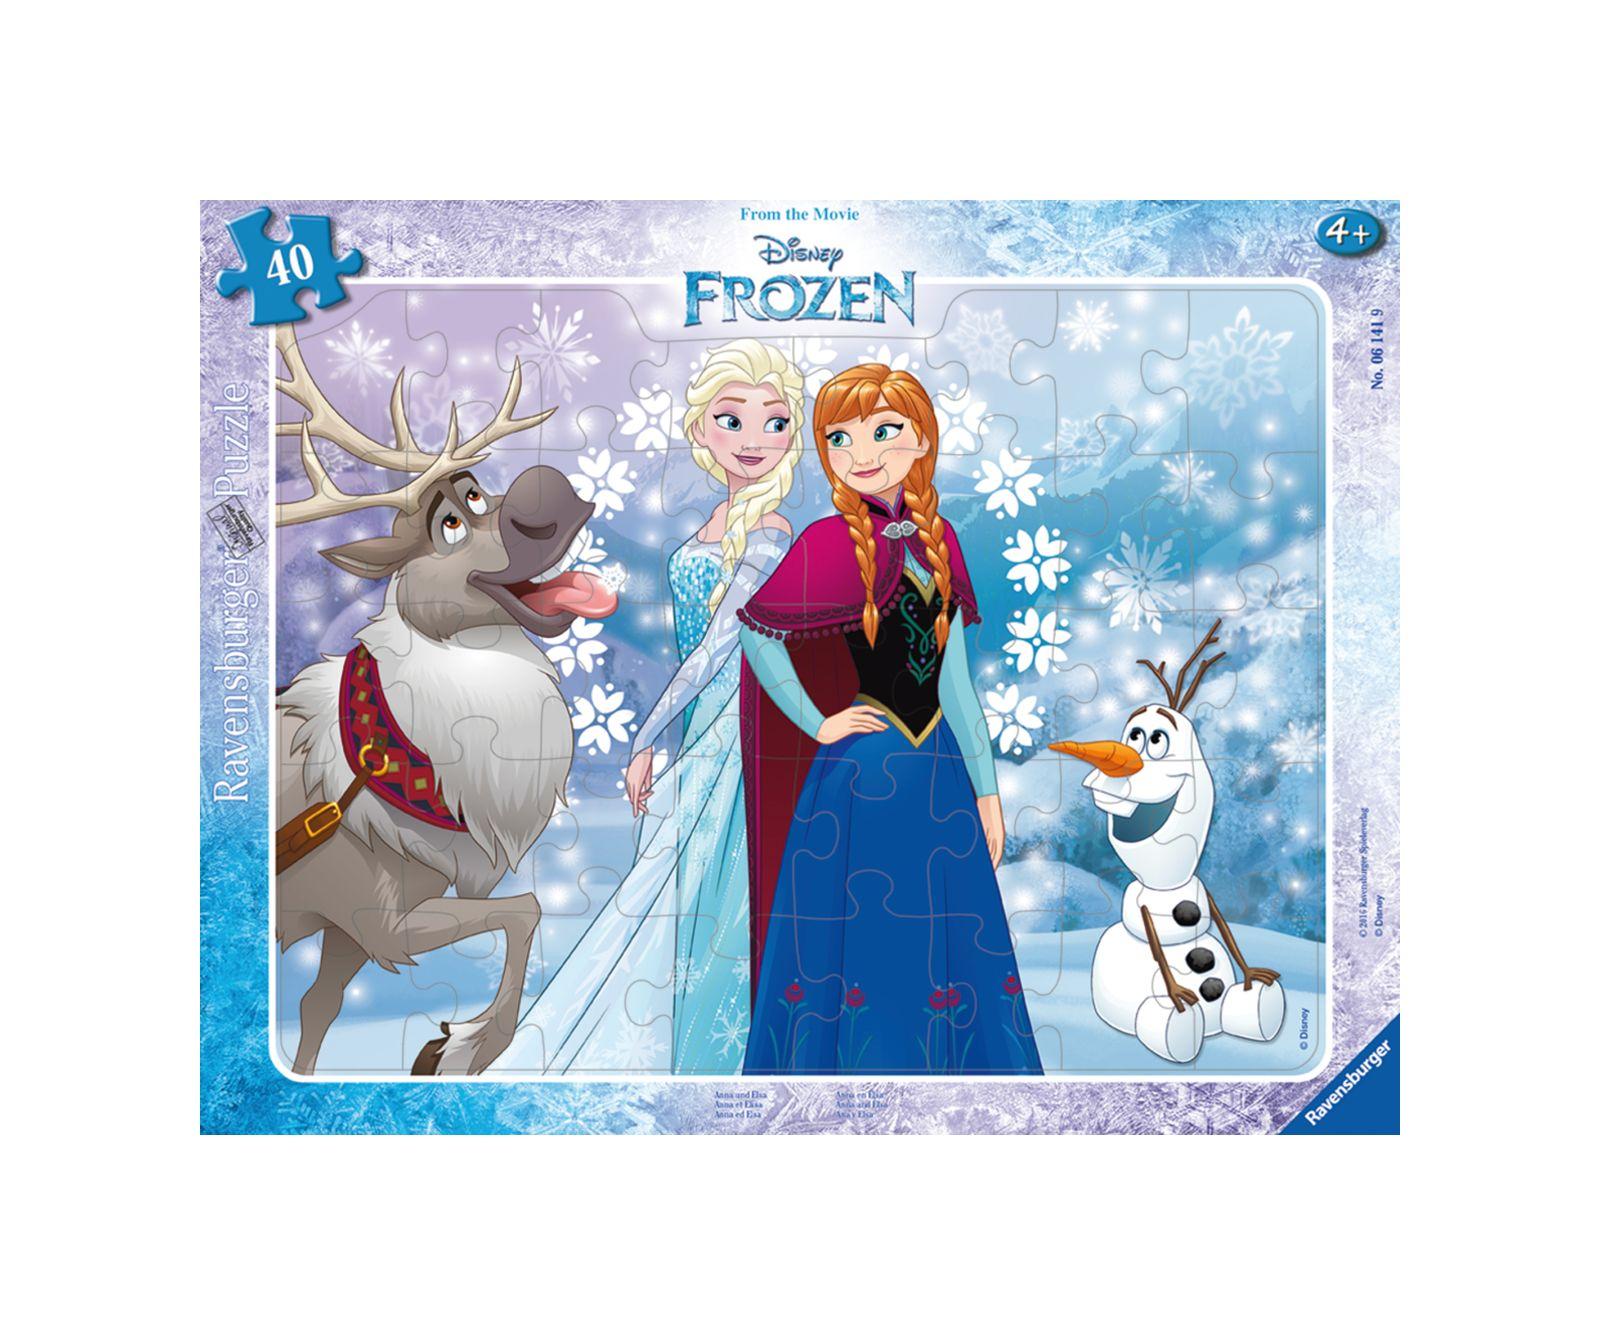 Ravensburger puzzle incorniciato frozen - Ravensburger1